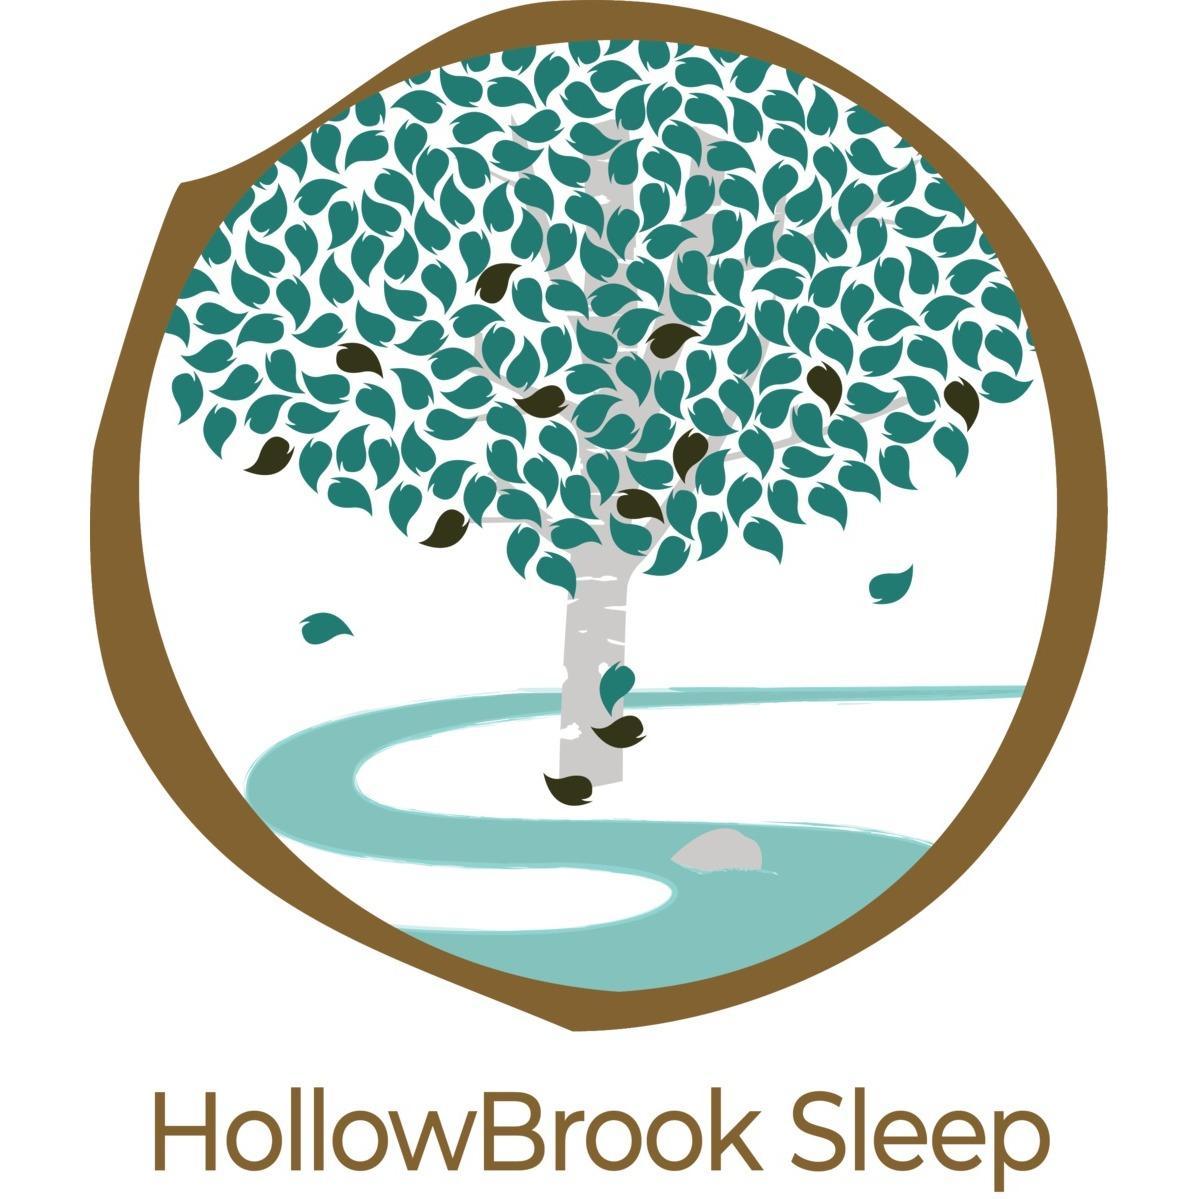 HollowBrook Sleep